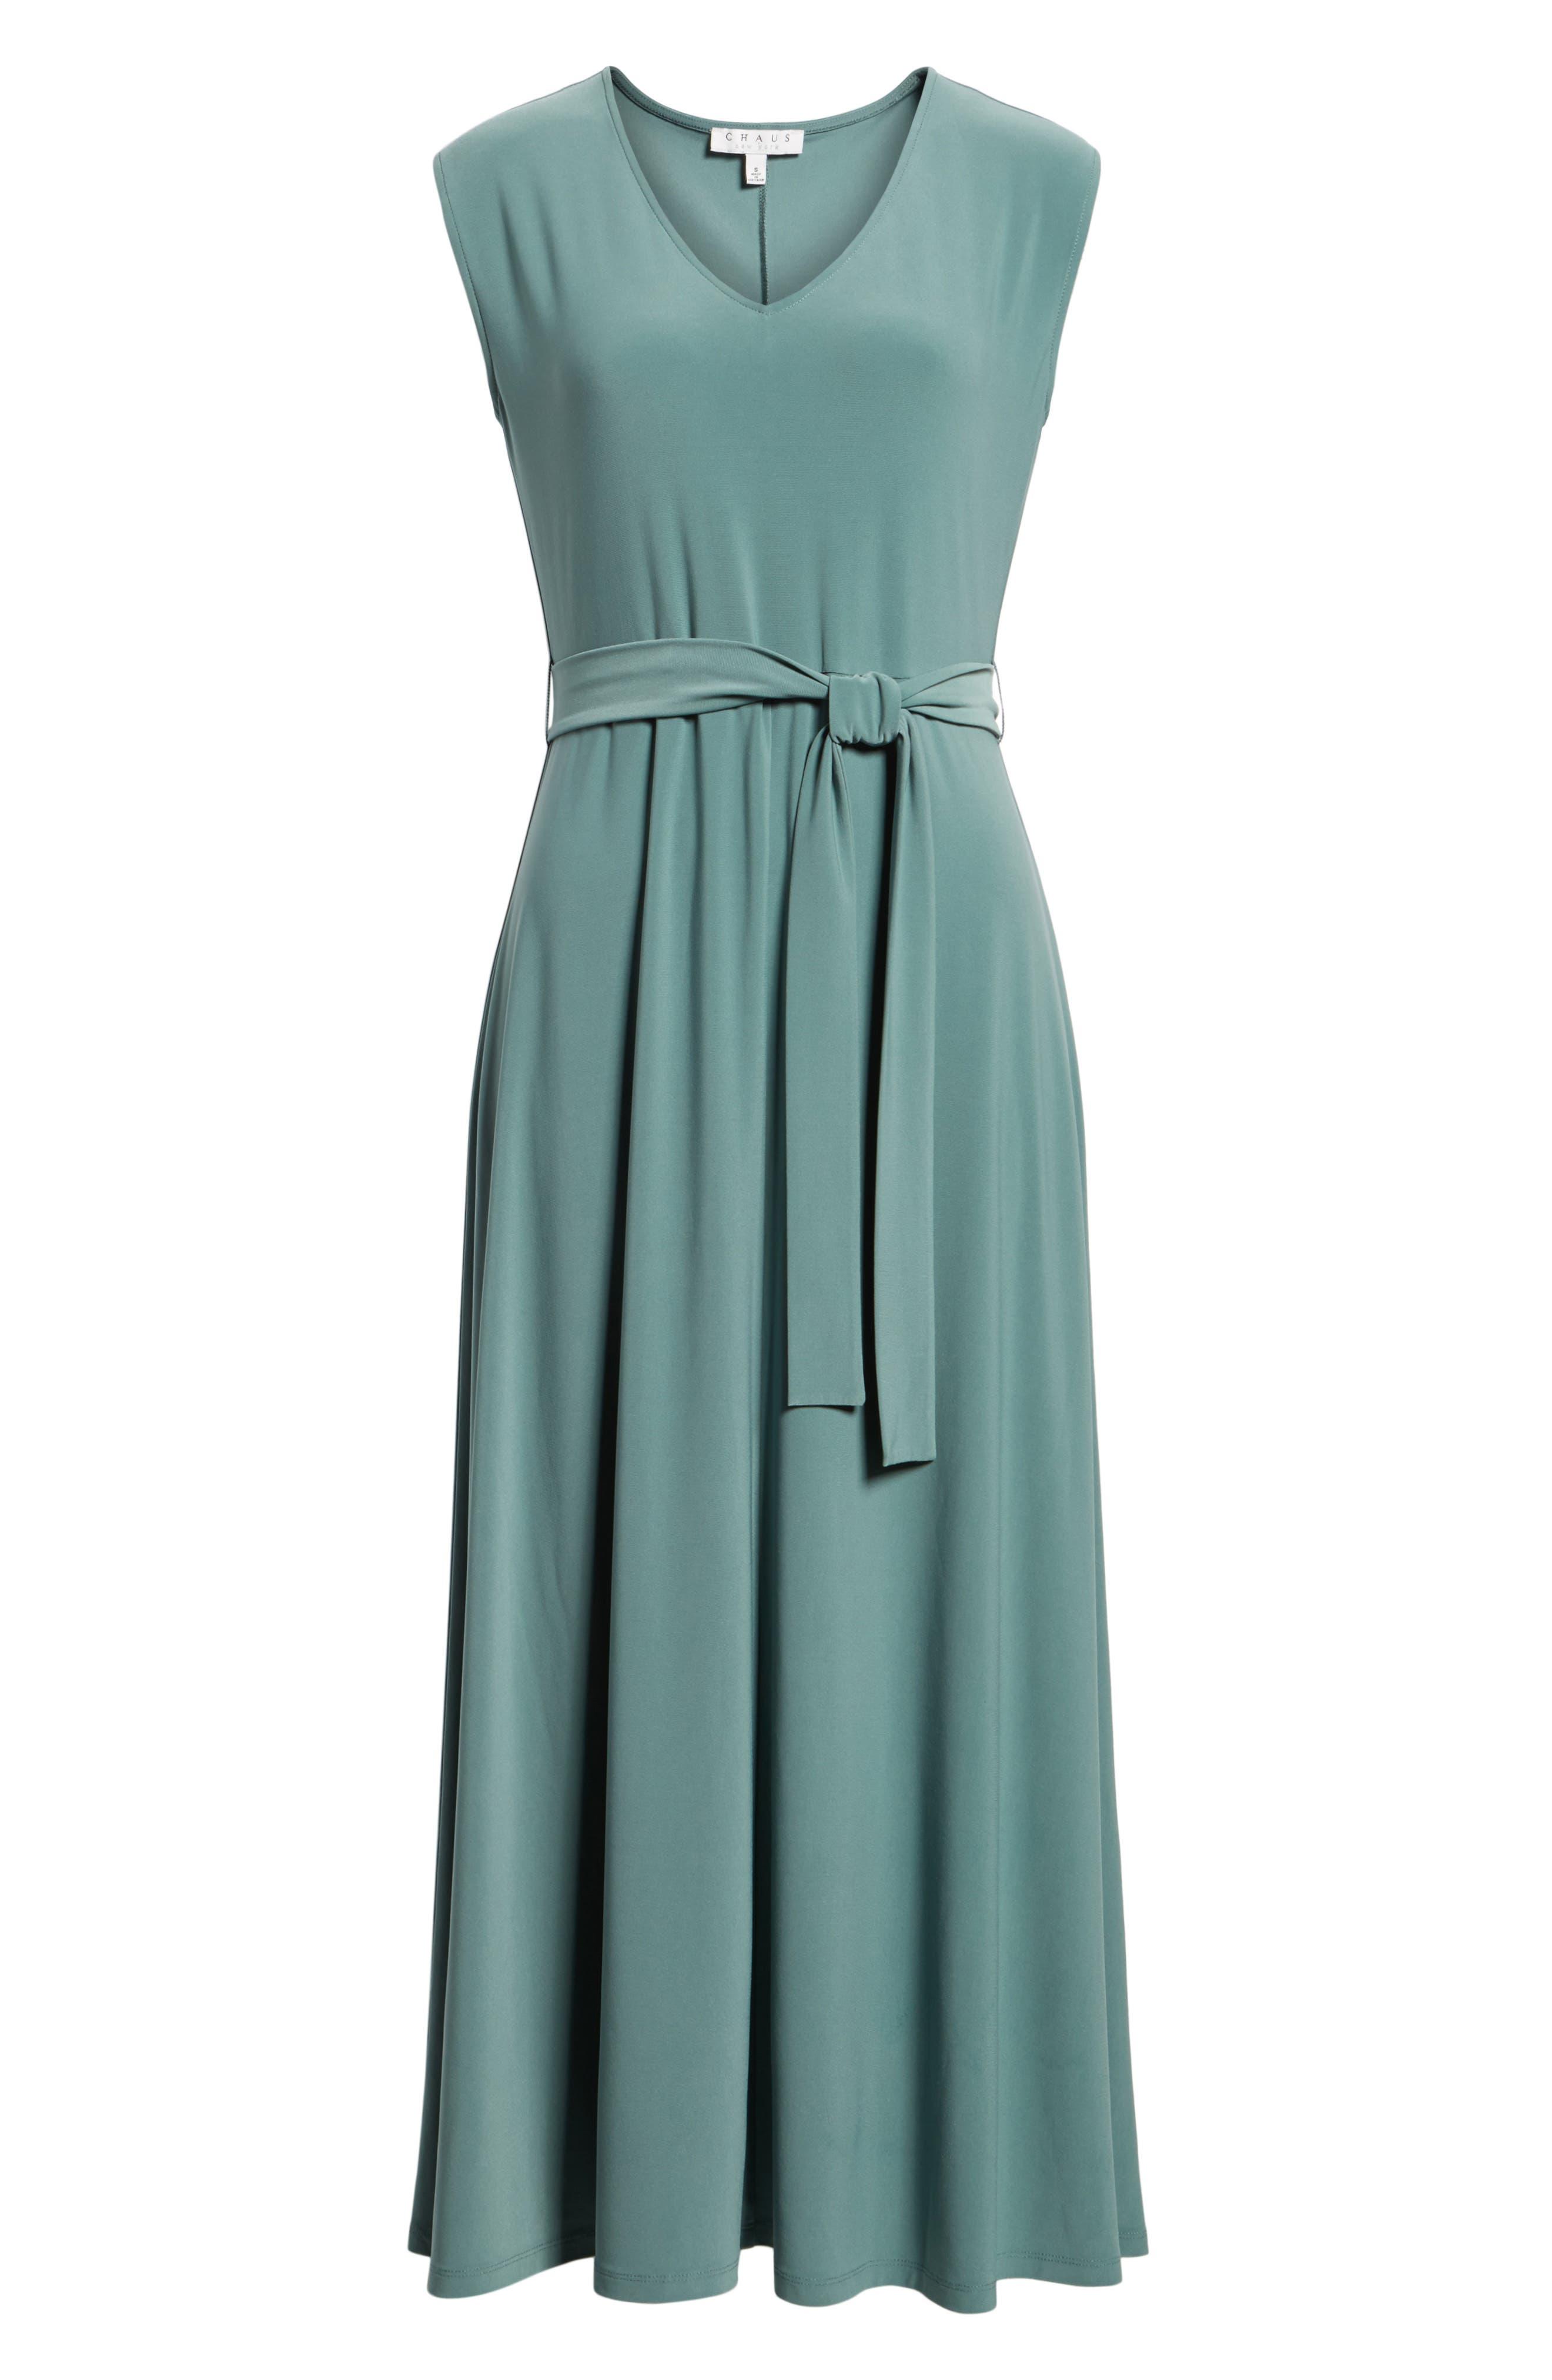 Tie Waist Maxi Dress,                             Alternate thumbnail 6, color,                             738-Tropic Moss